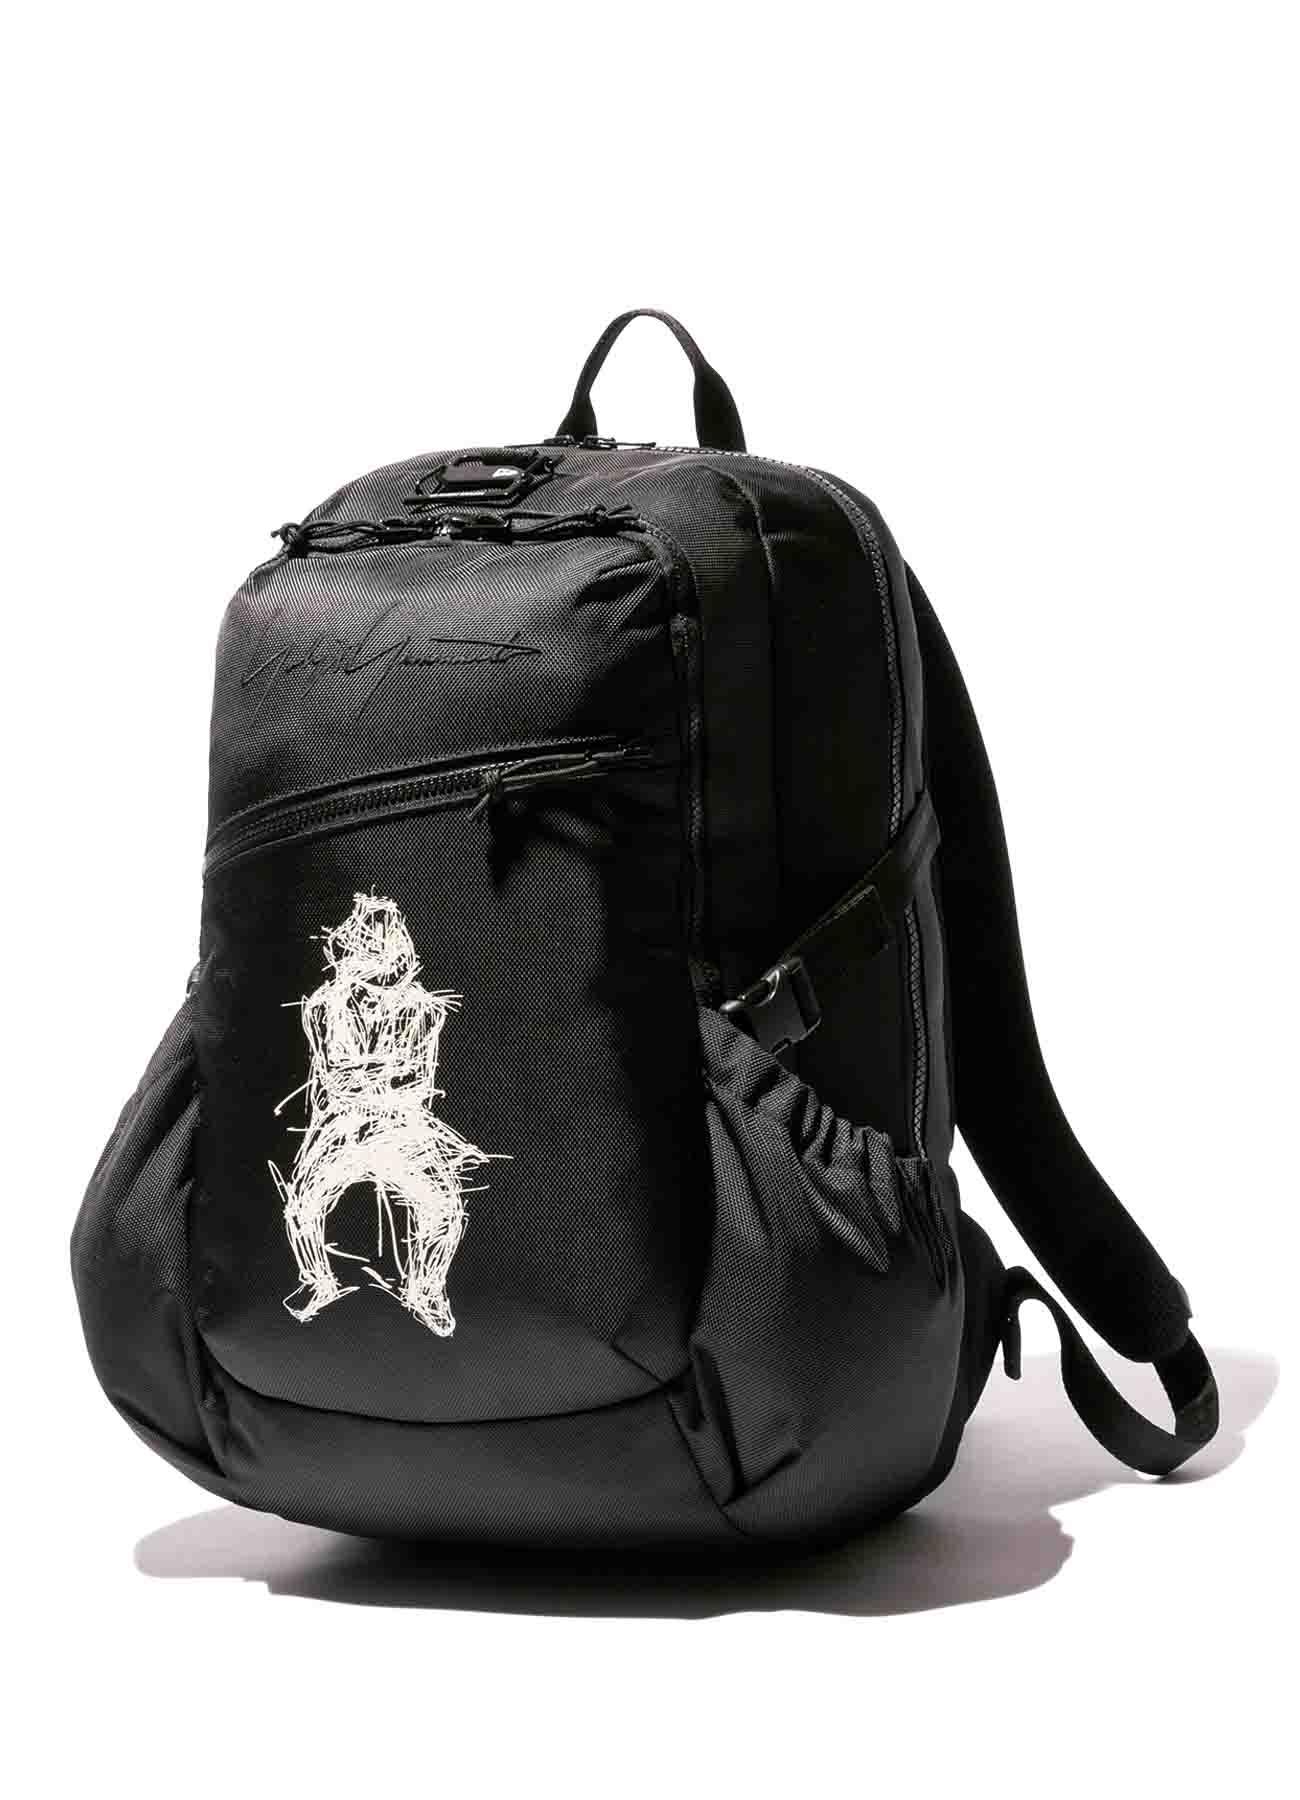 Yohji Yamamoto × New Era 1680D/BLACK POLYESTER URBAN PACK